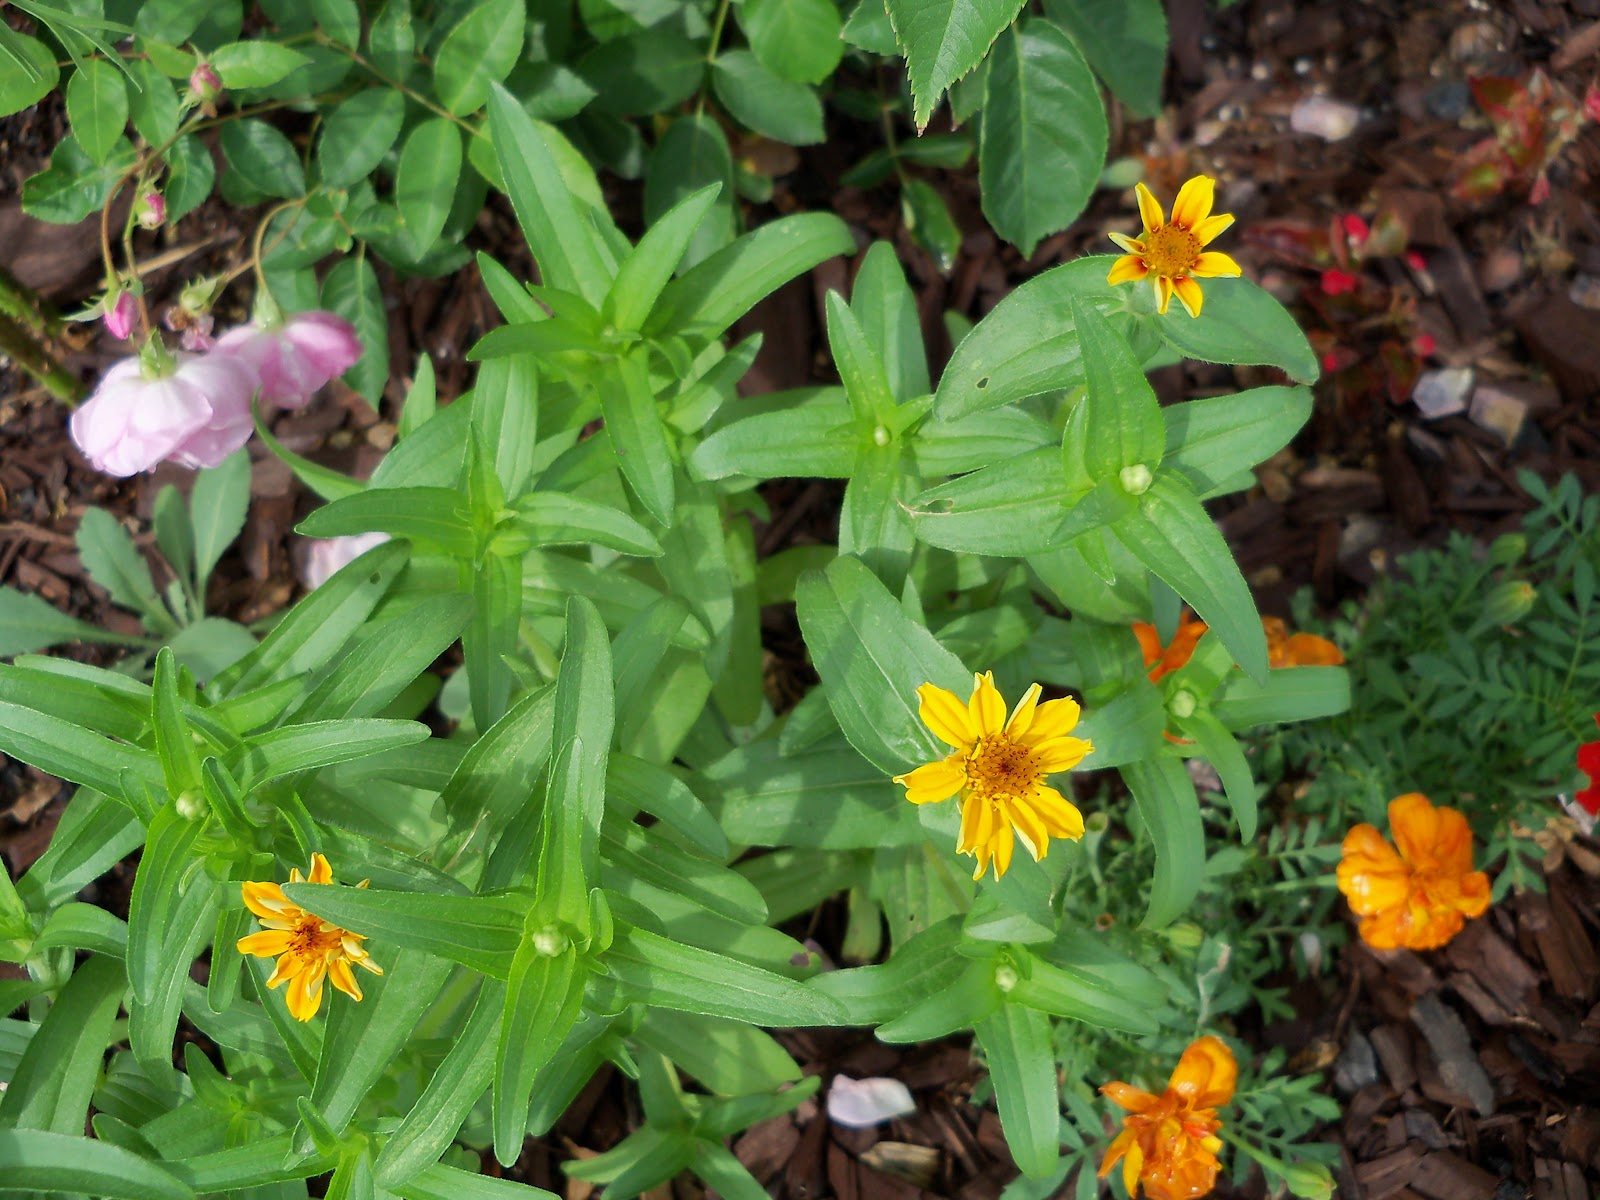 Gardening 2010, Part Two - 101_2163.JPG